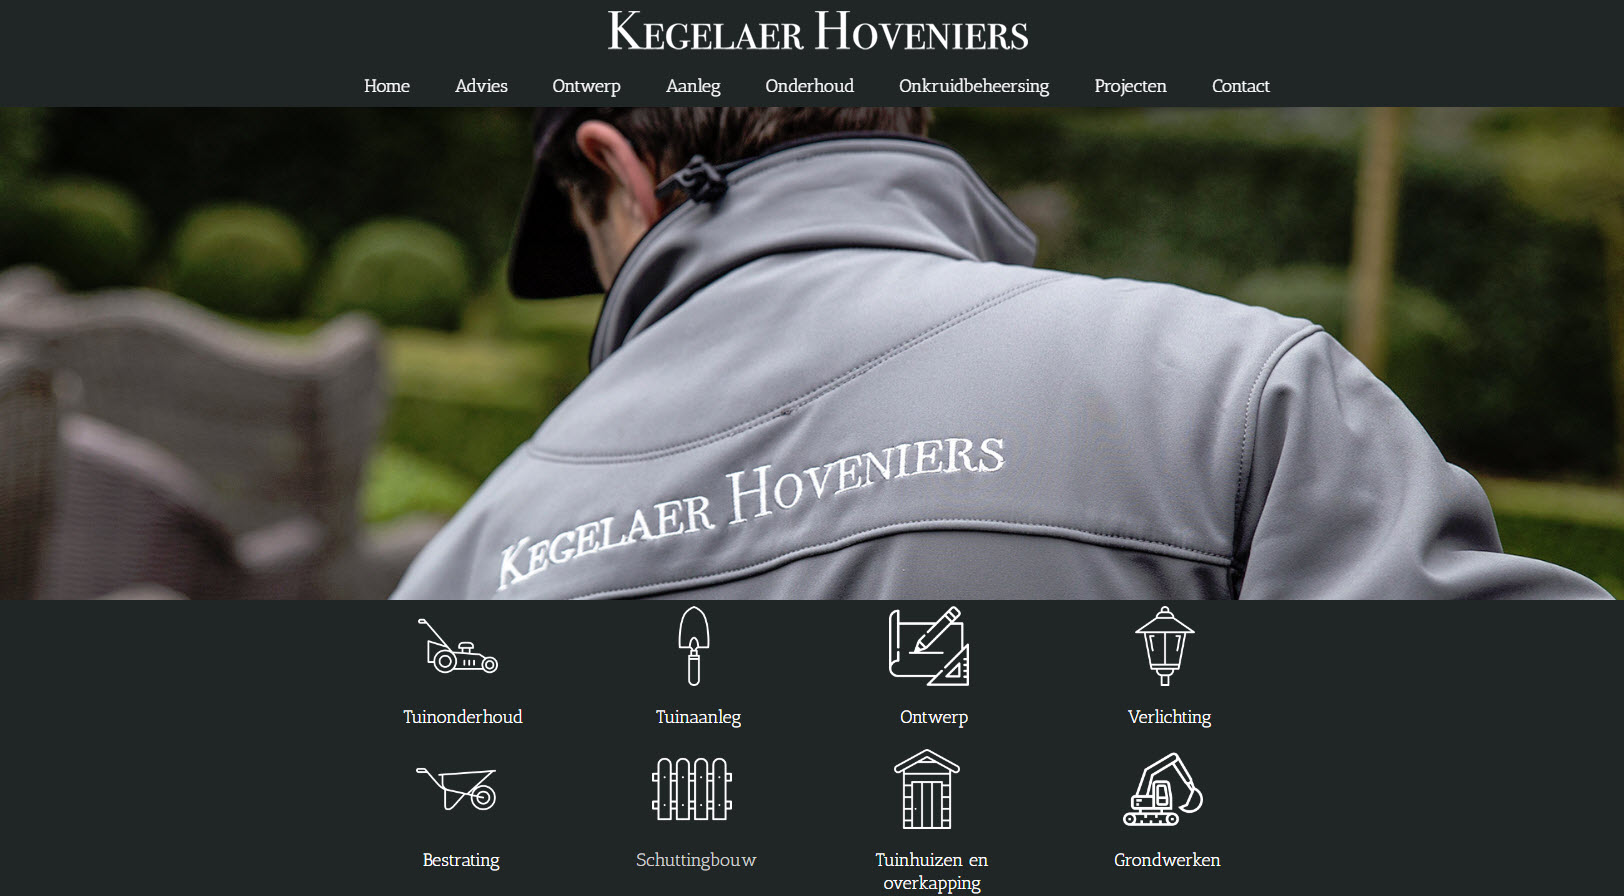 Kegelaer Hoveniers